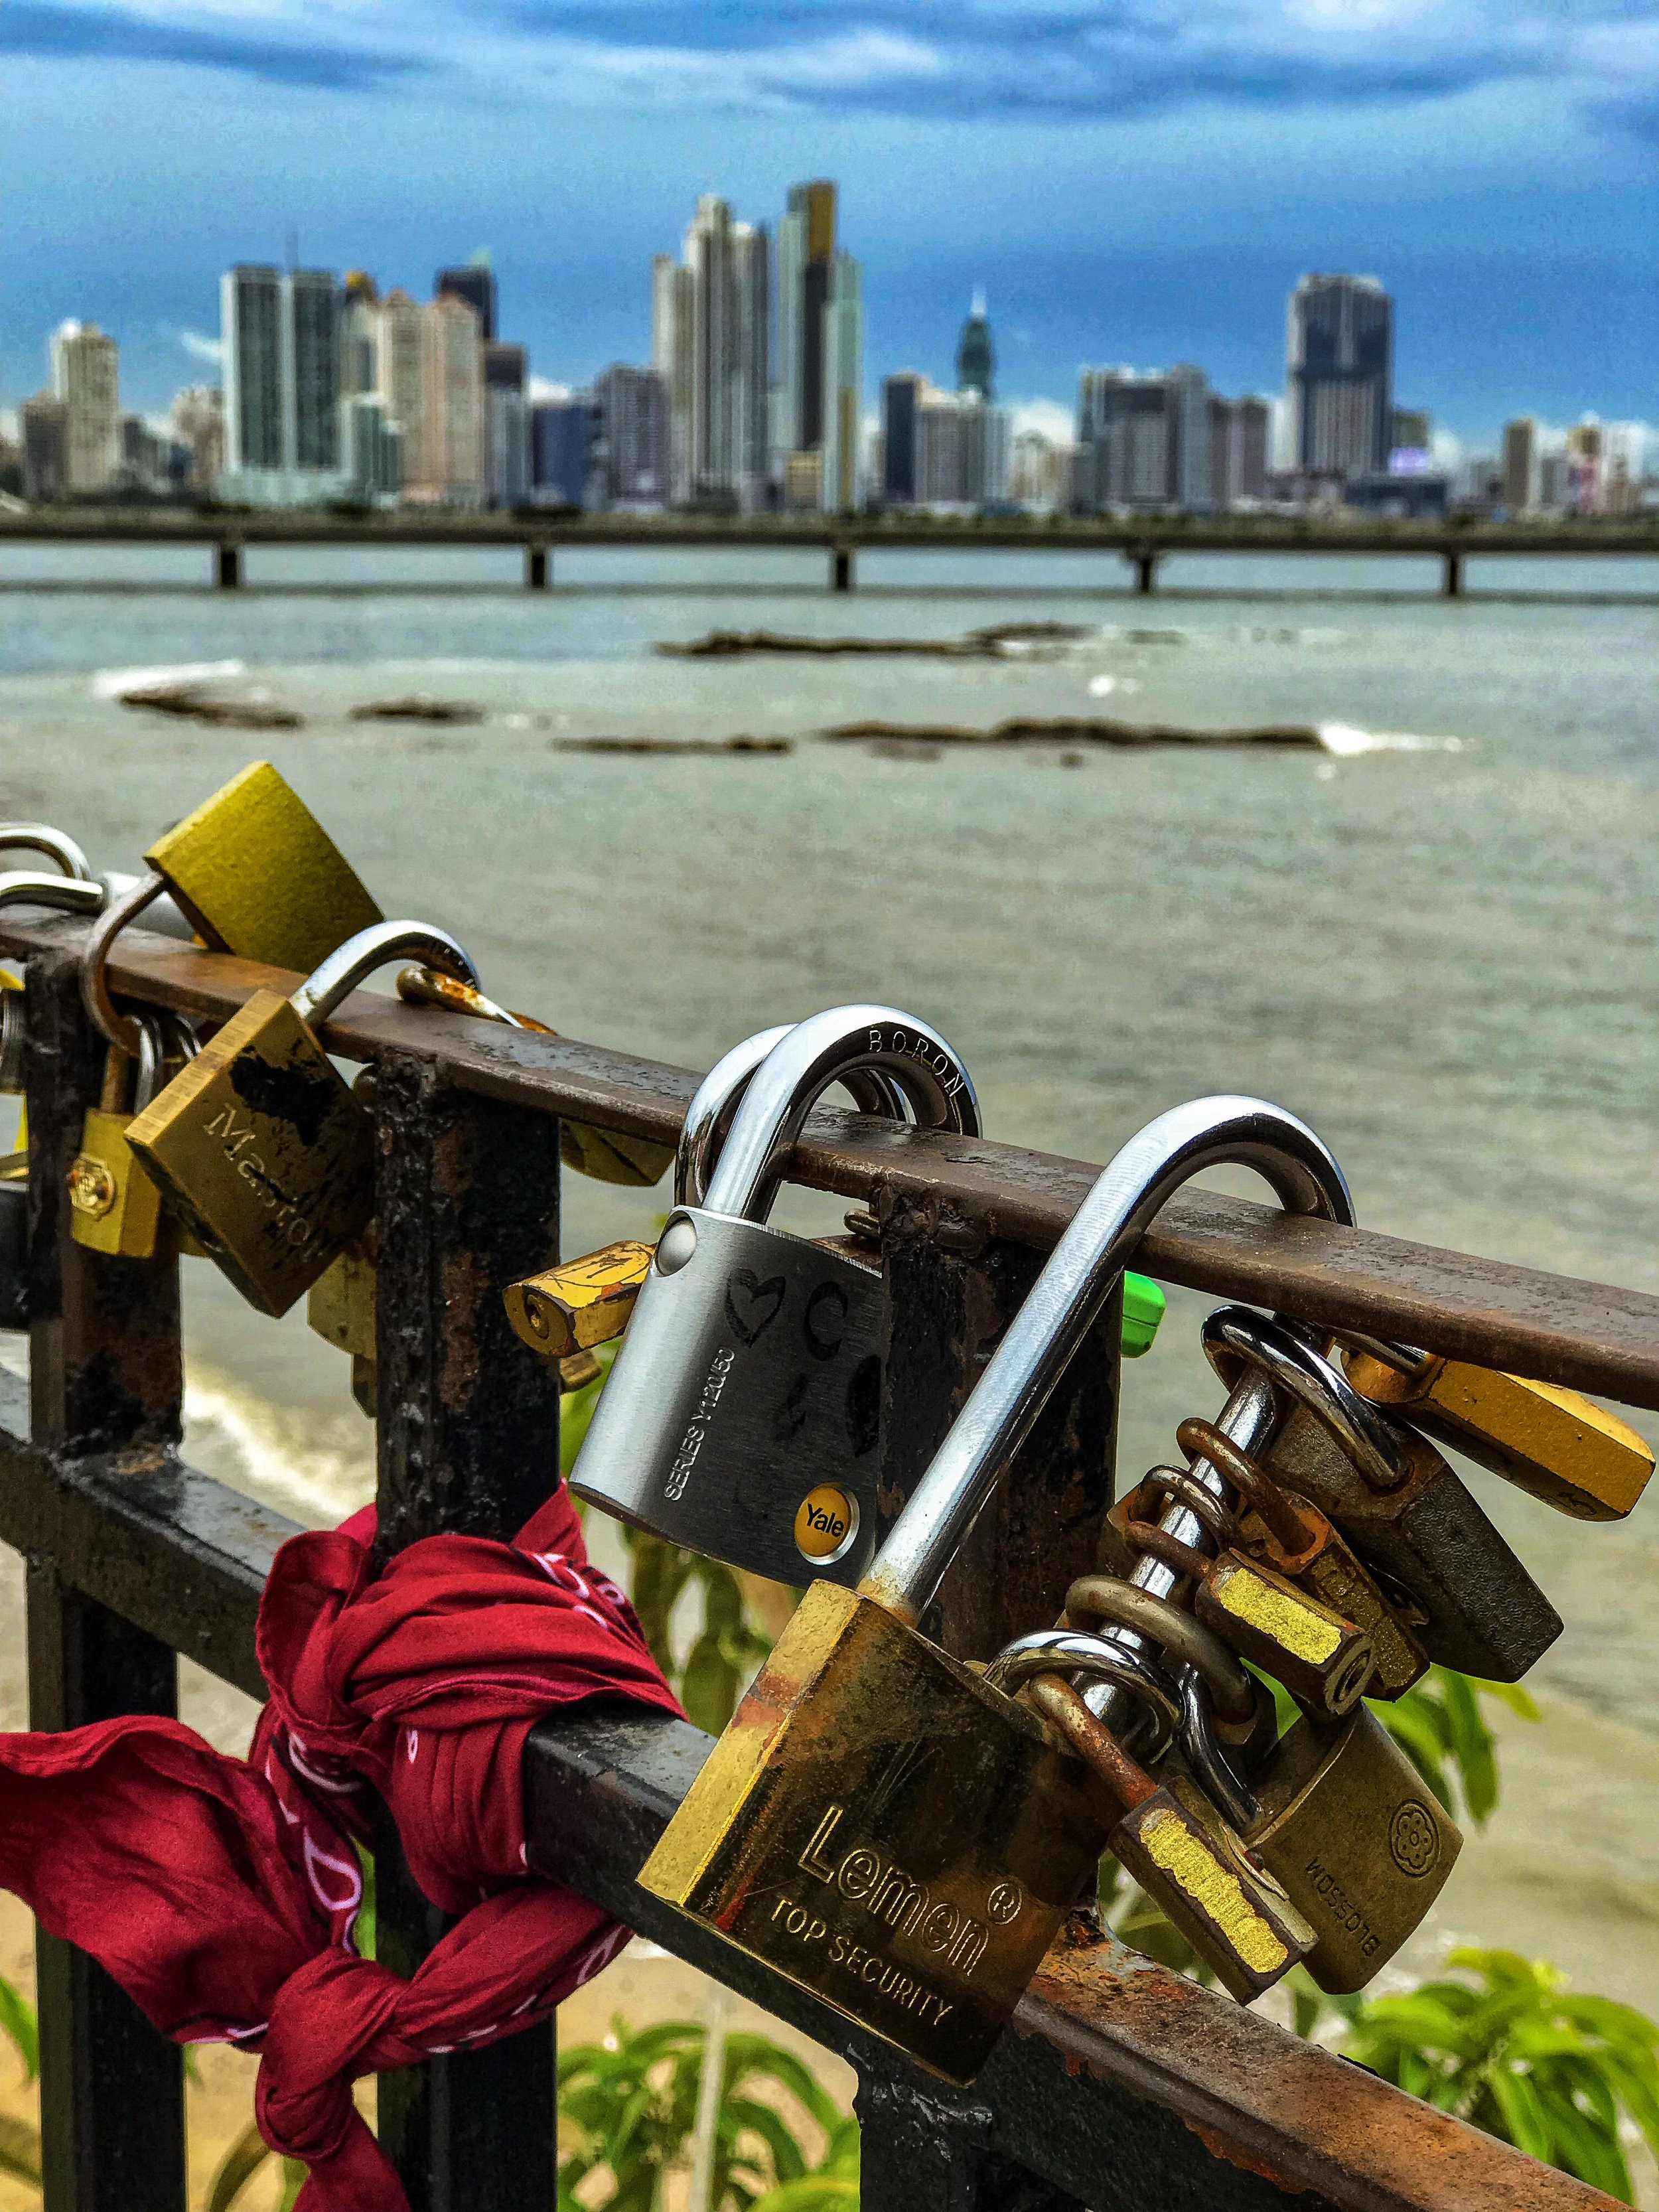 Locks of Love in Panama